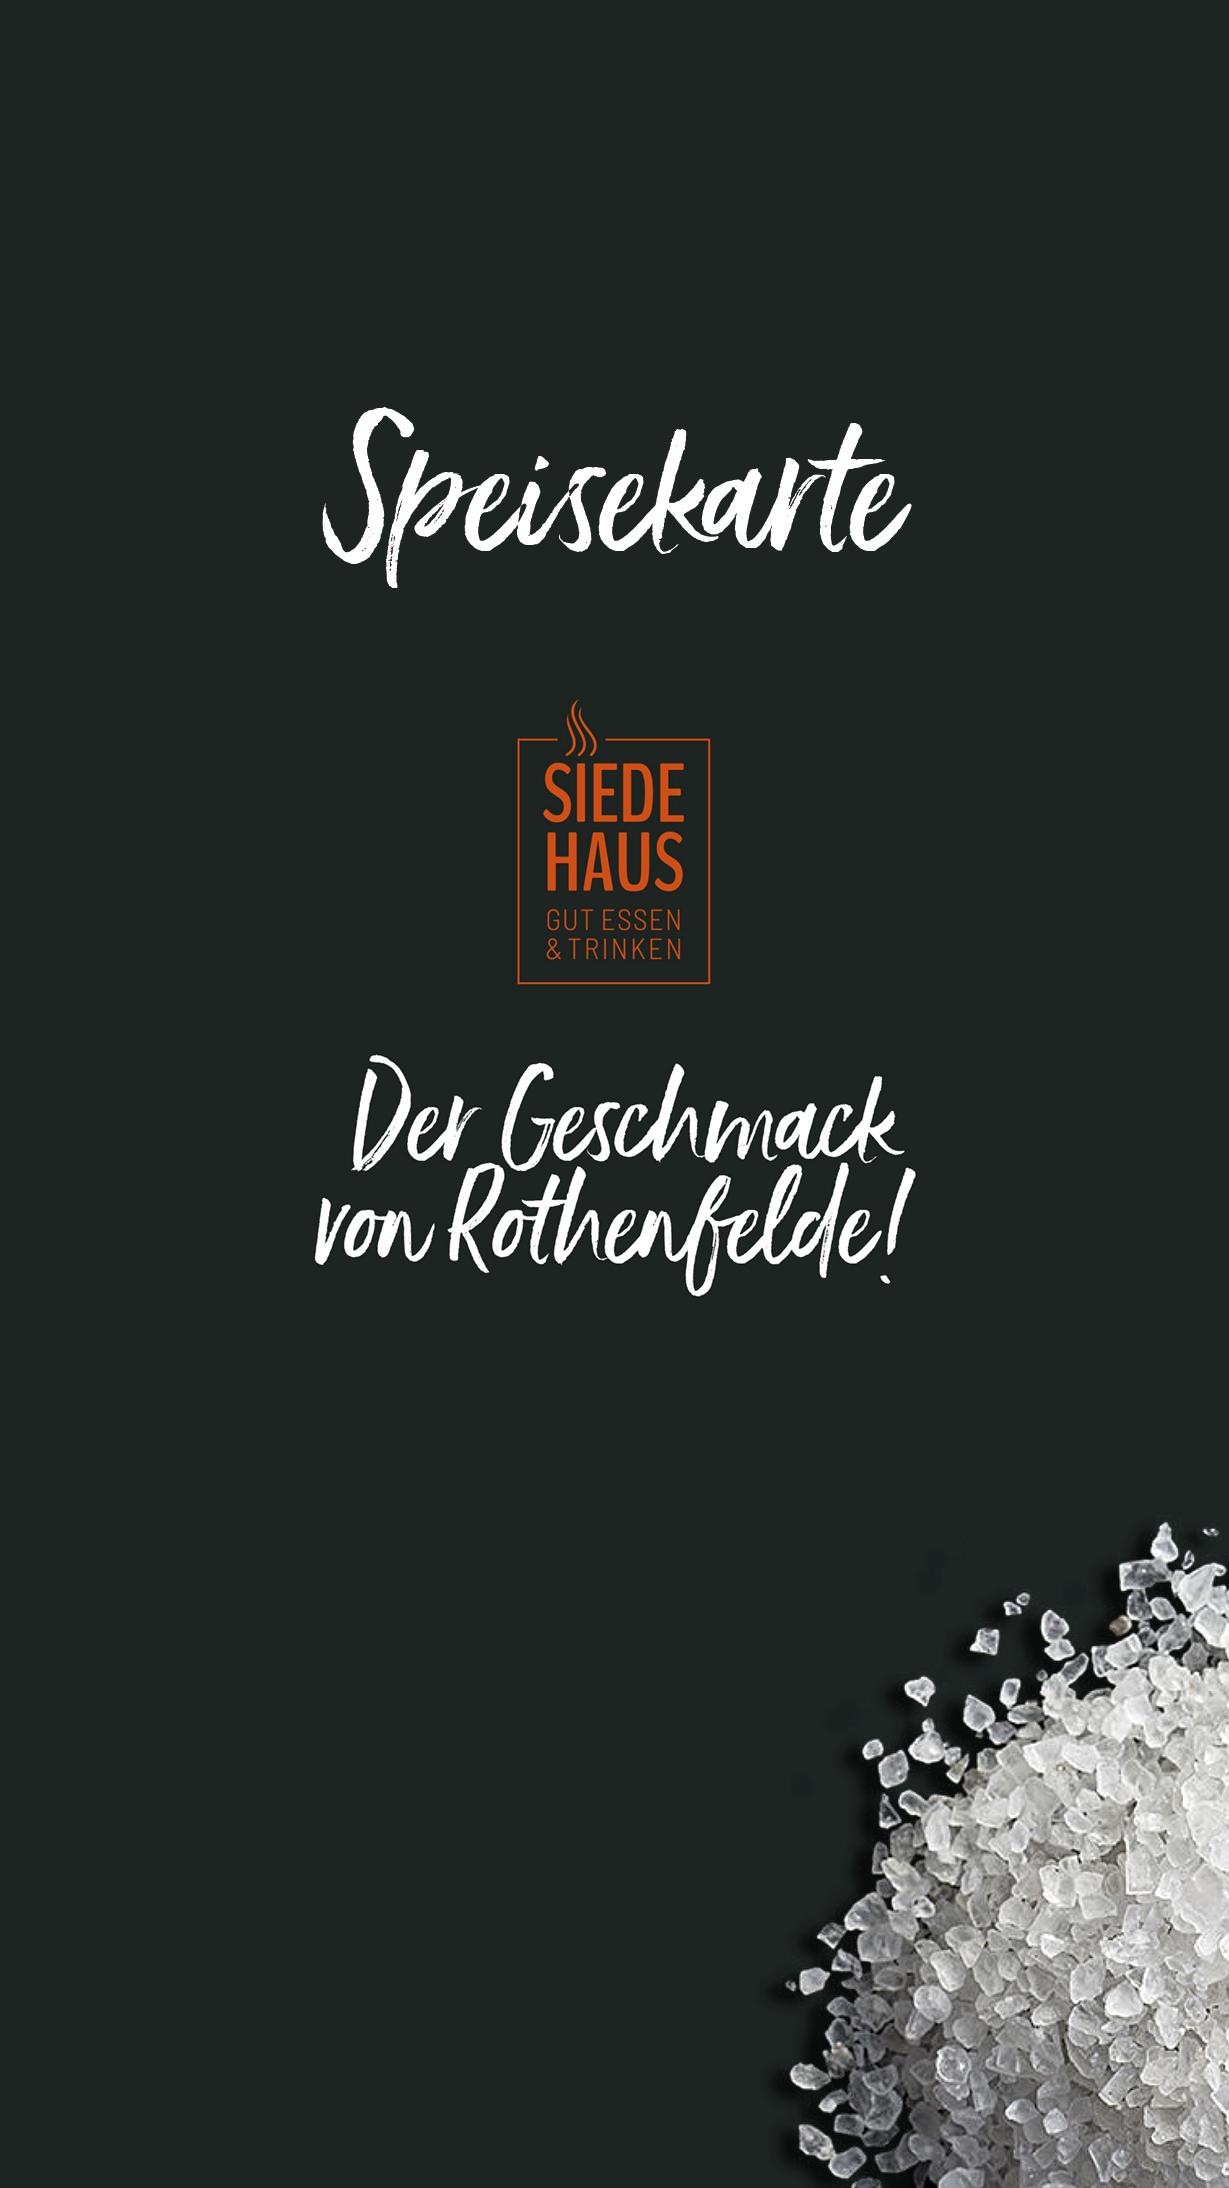 Siedehaus_Speisekarte